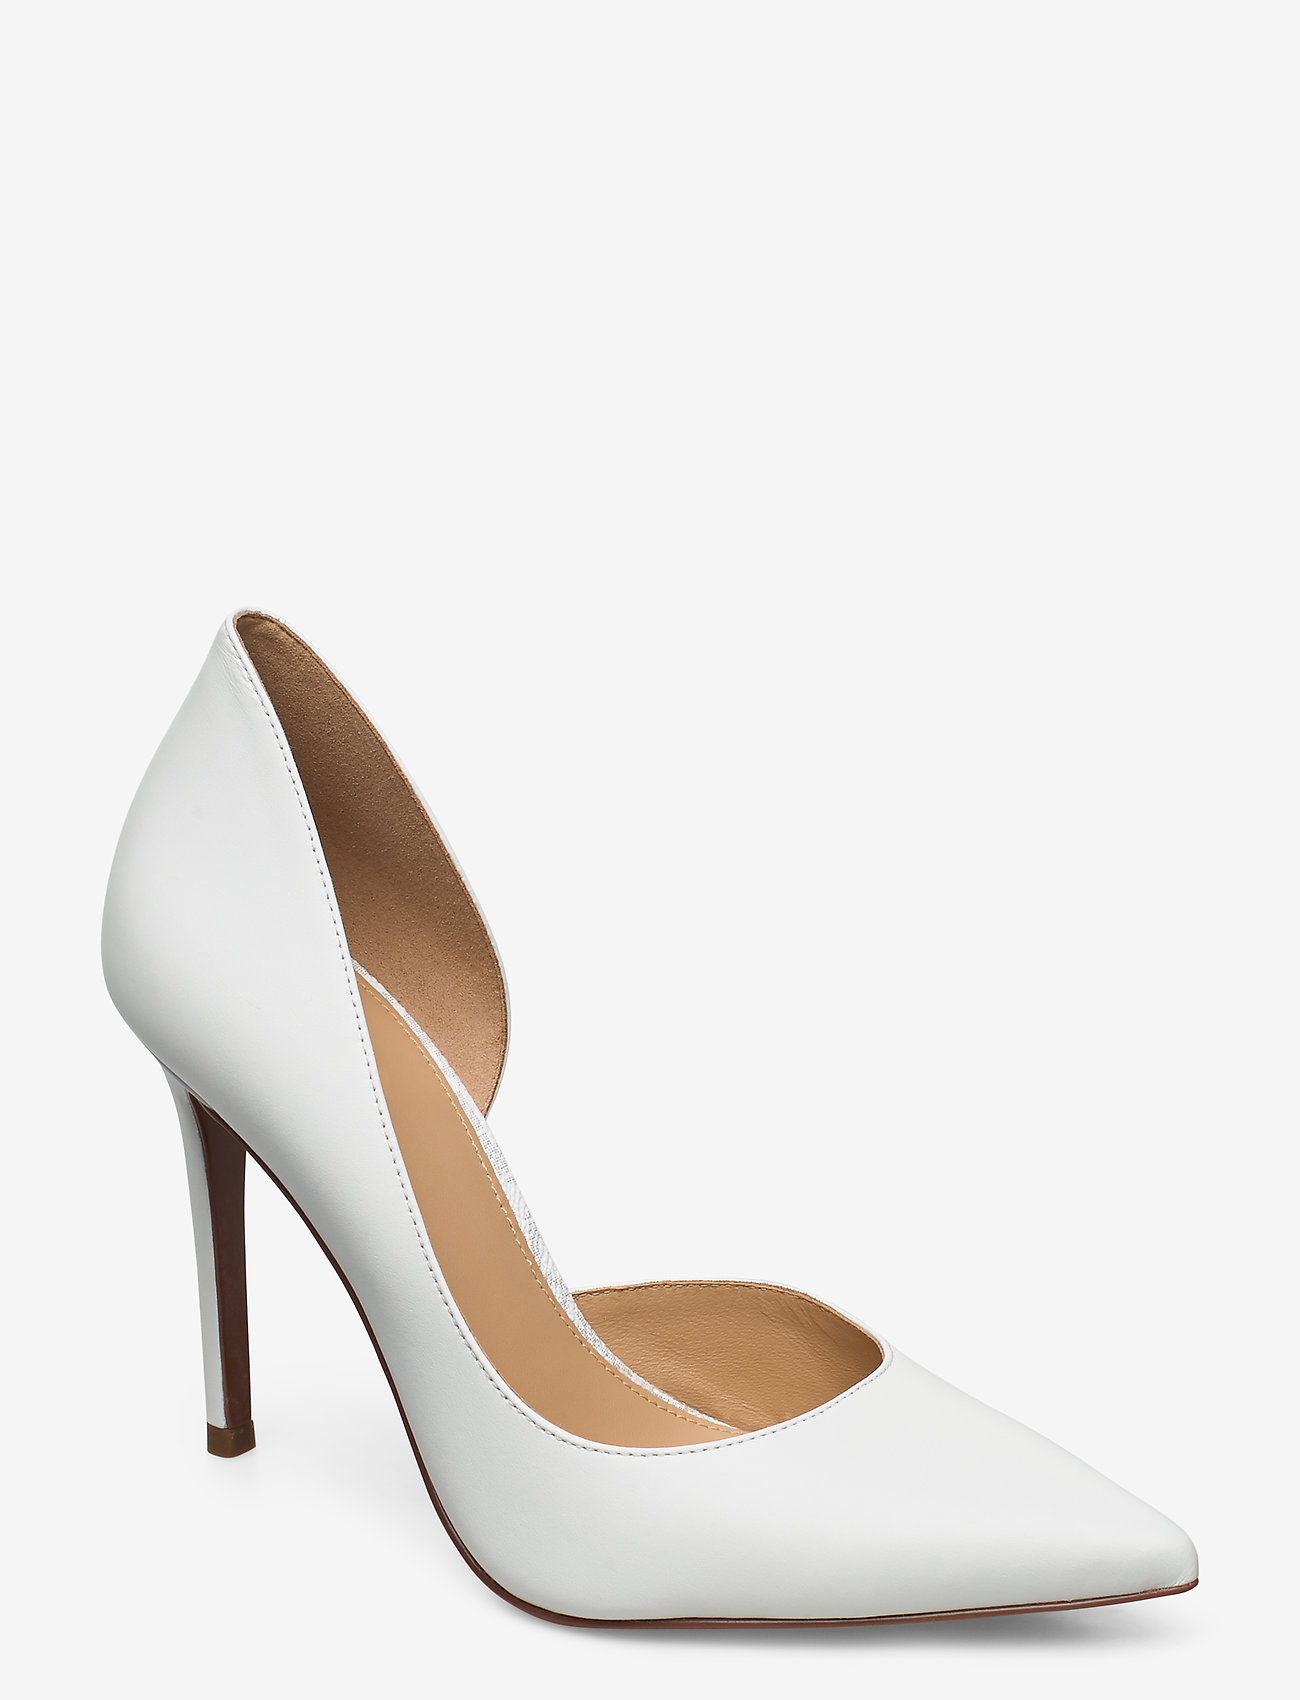 114.75) - Michael Kors Shoes - | Boozt